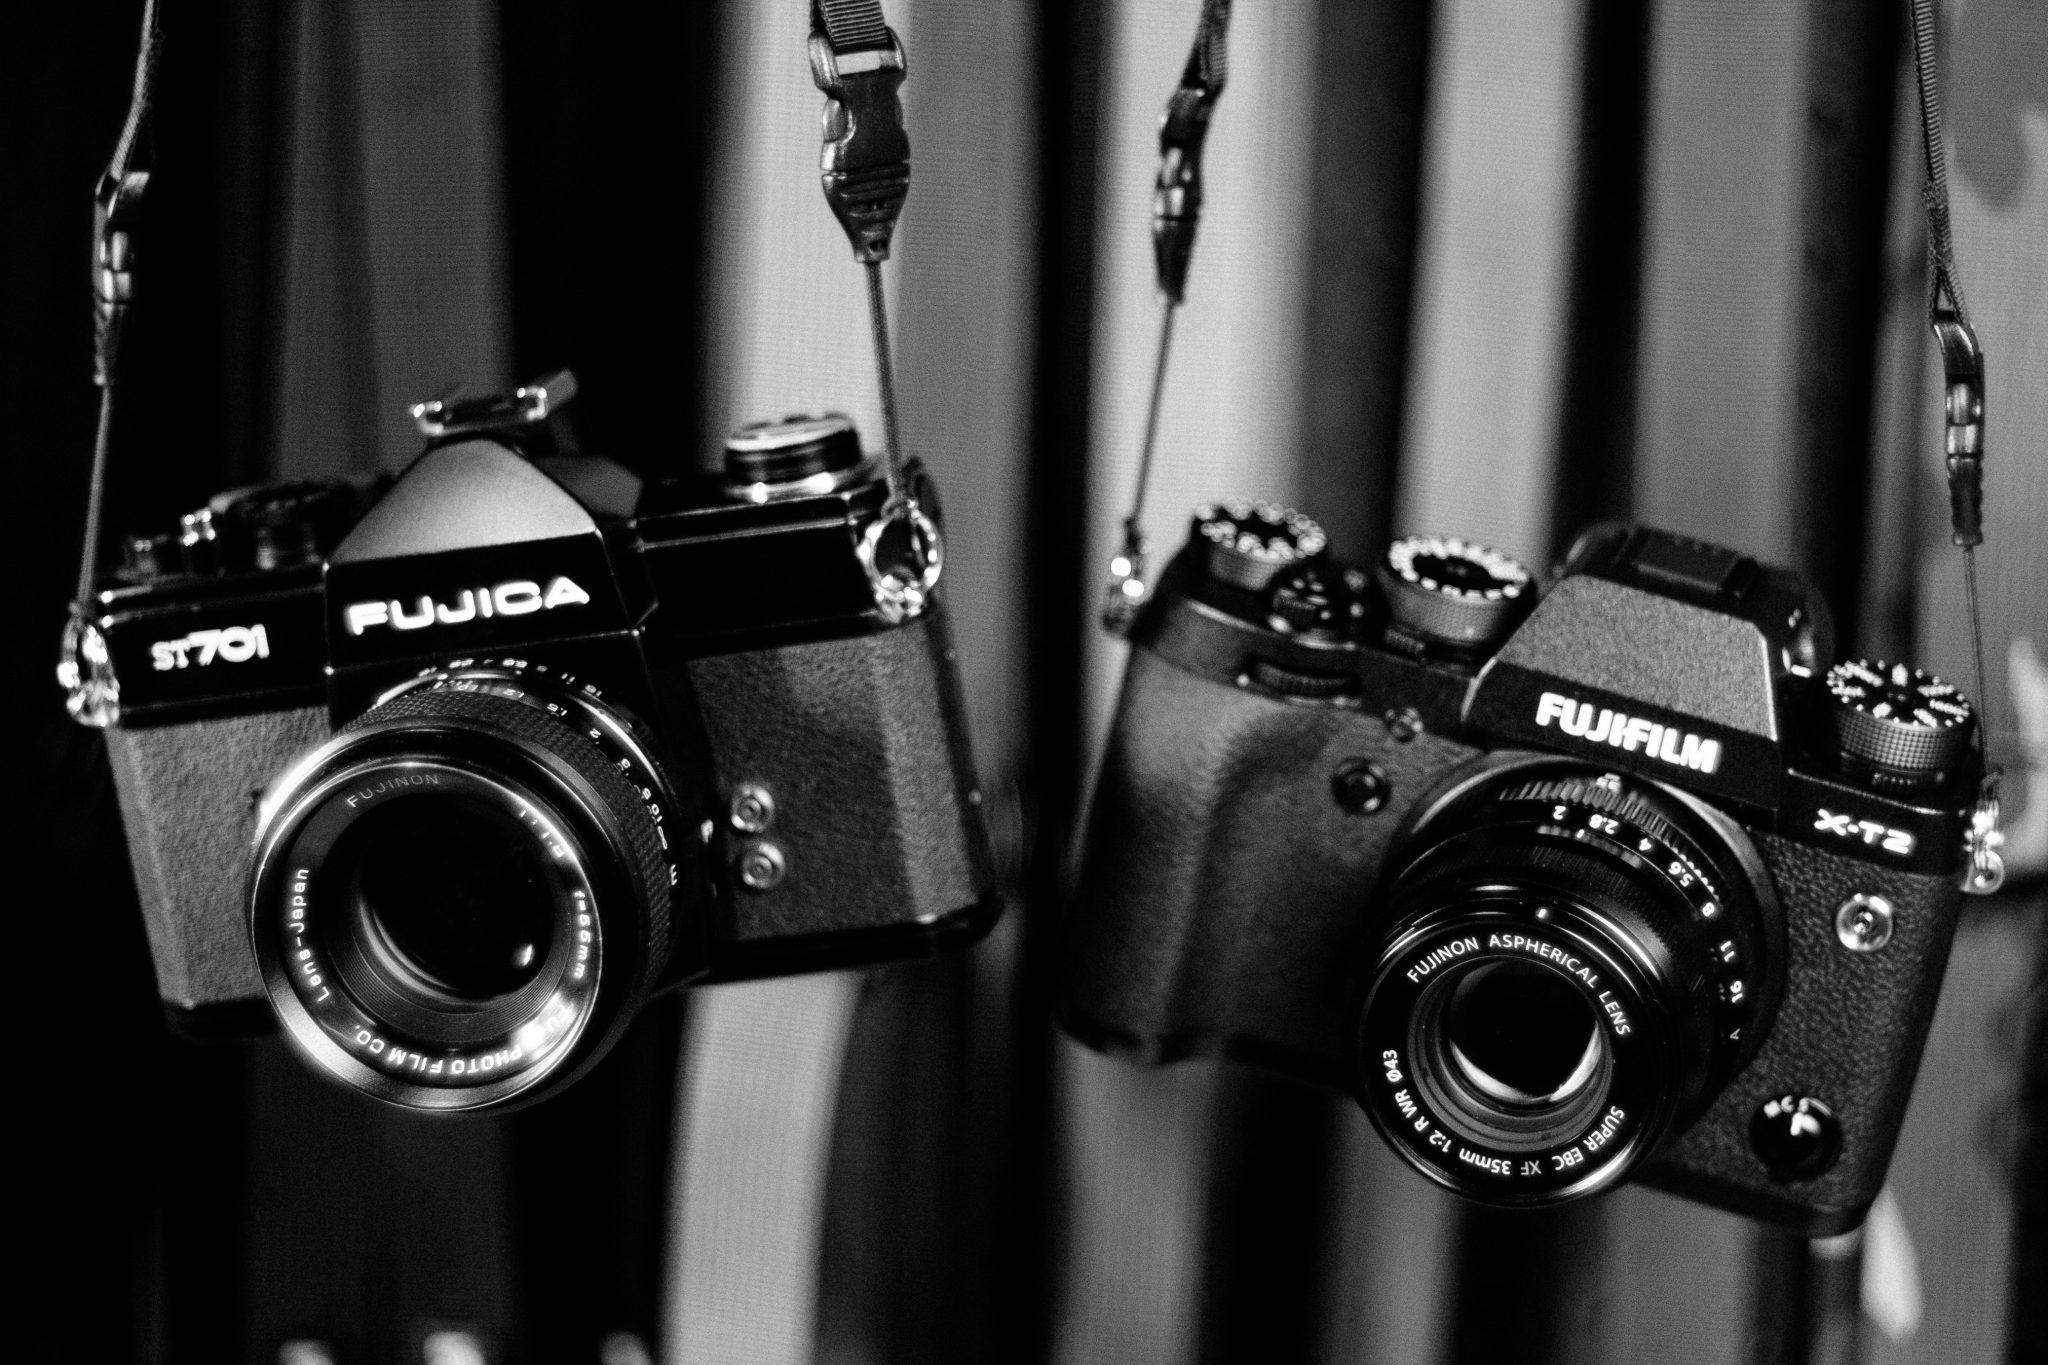 Fujica ST701 and Fujifilm X-T2